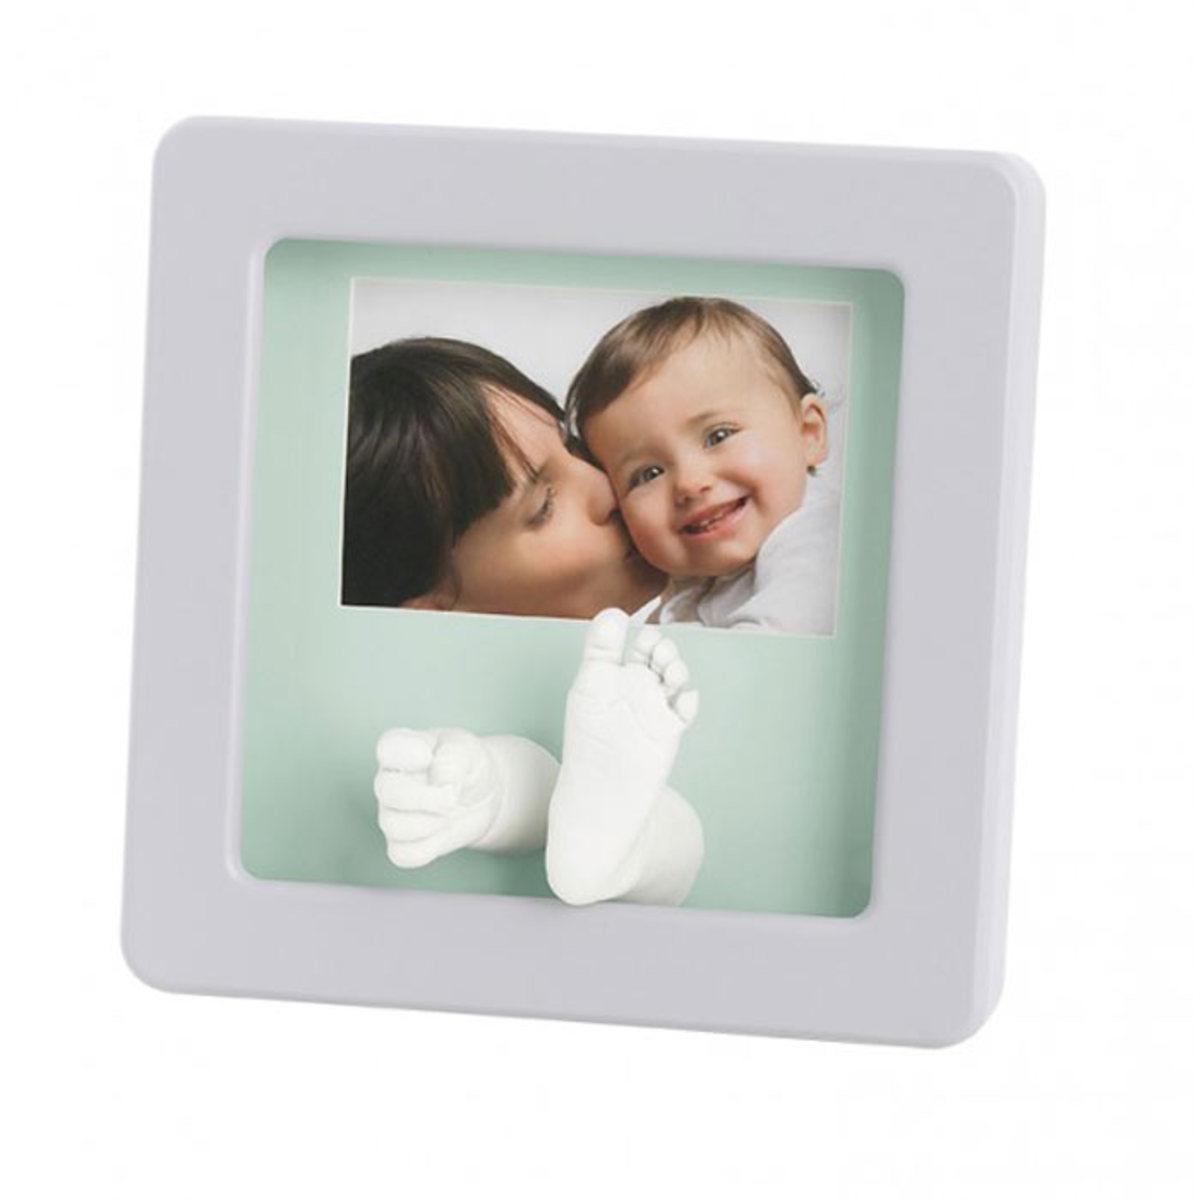 Baby Art Kit Dempreinte 3d Sculpture Cadre Photo Empreinte